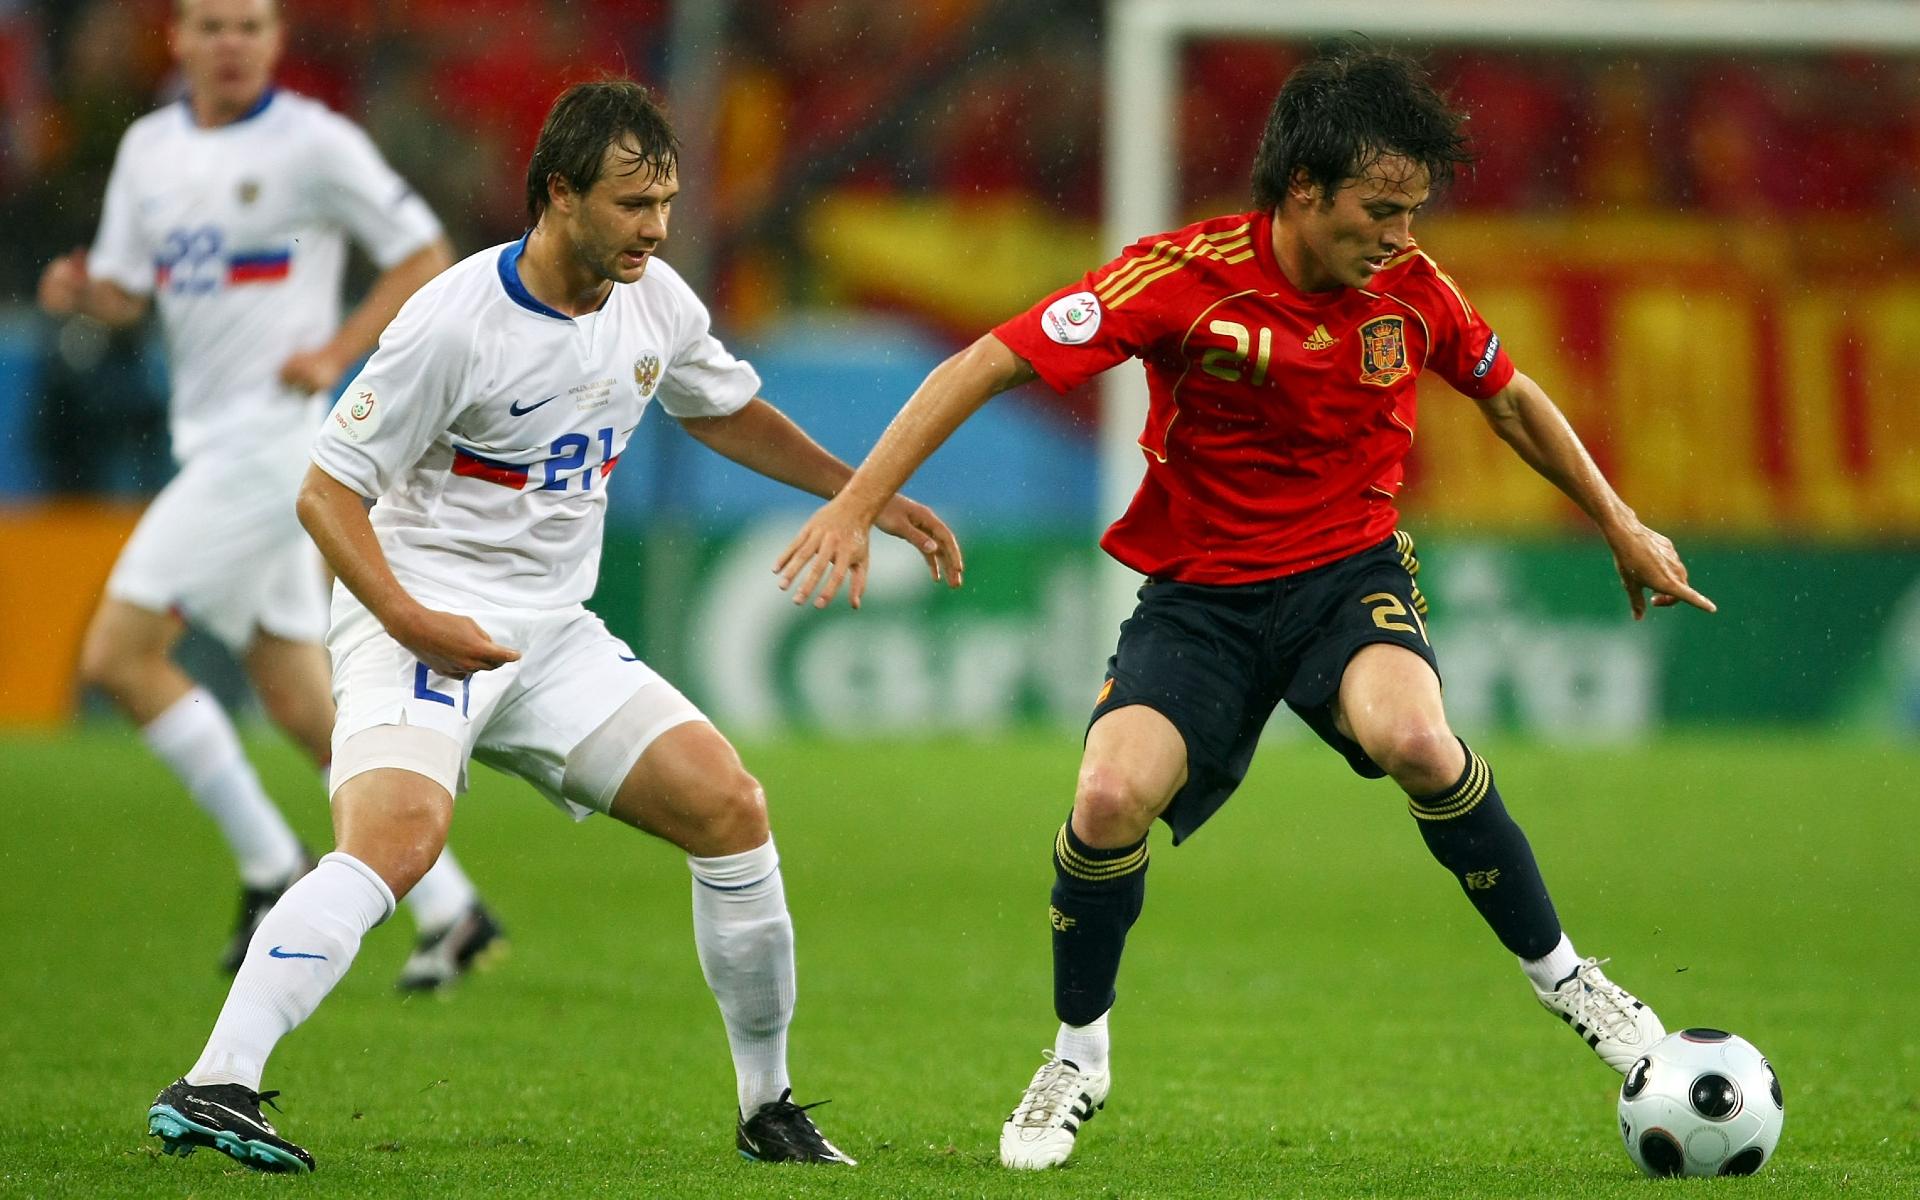 Фото: Дмитрий Сычев (слева) против Давида Сильвы (справа) на Евро-2008  (Photo by Richard Heathcote/Getty Images)